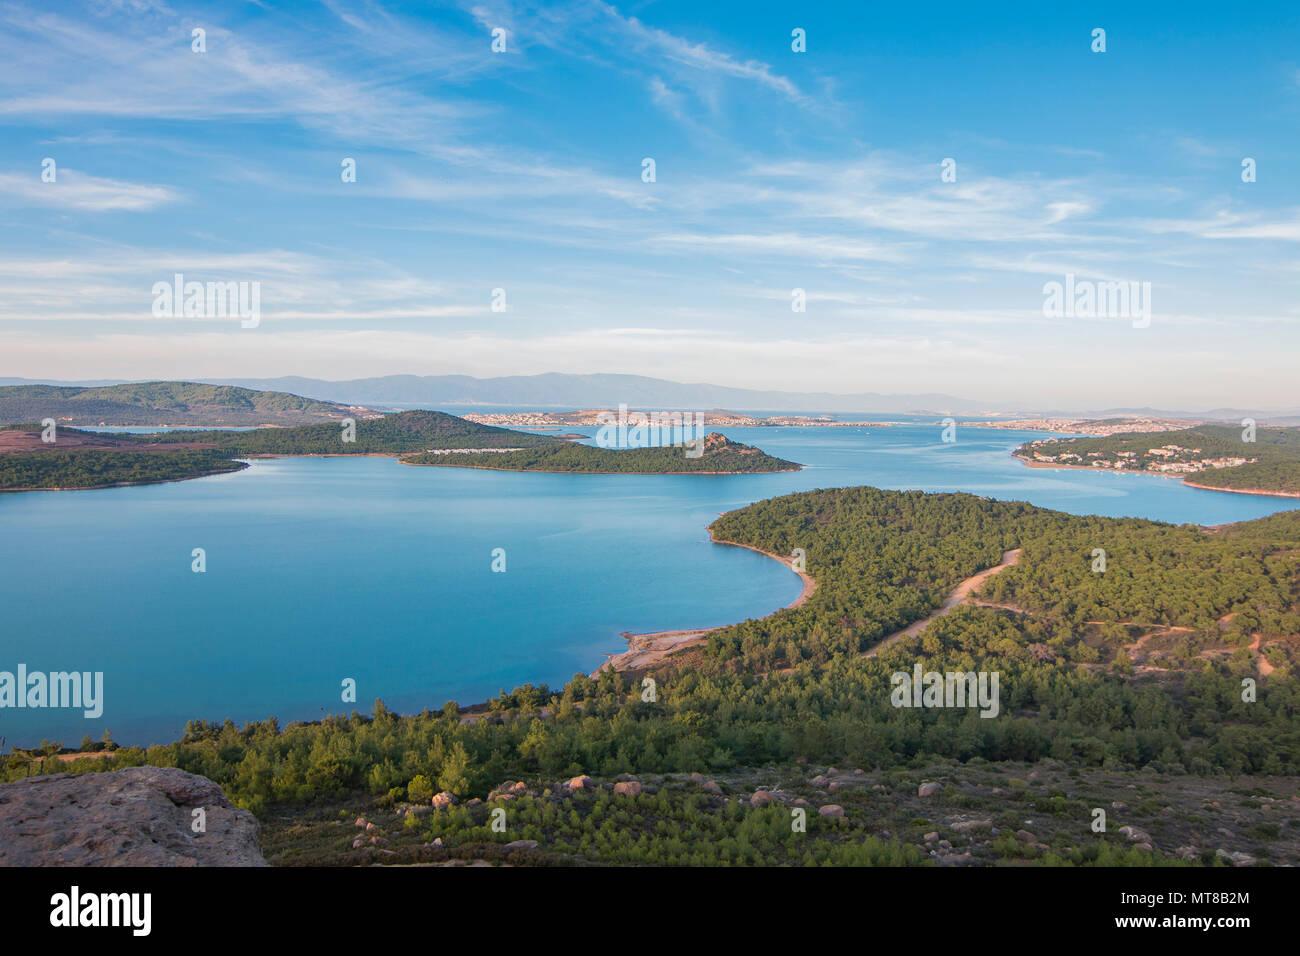 Seytan Sofrasi view in Ayvalik, Balikesir, Turkey - Stock Image